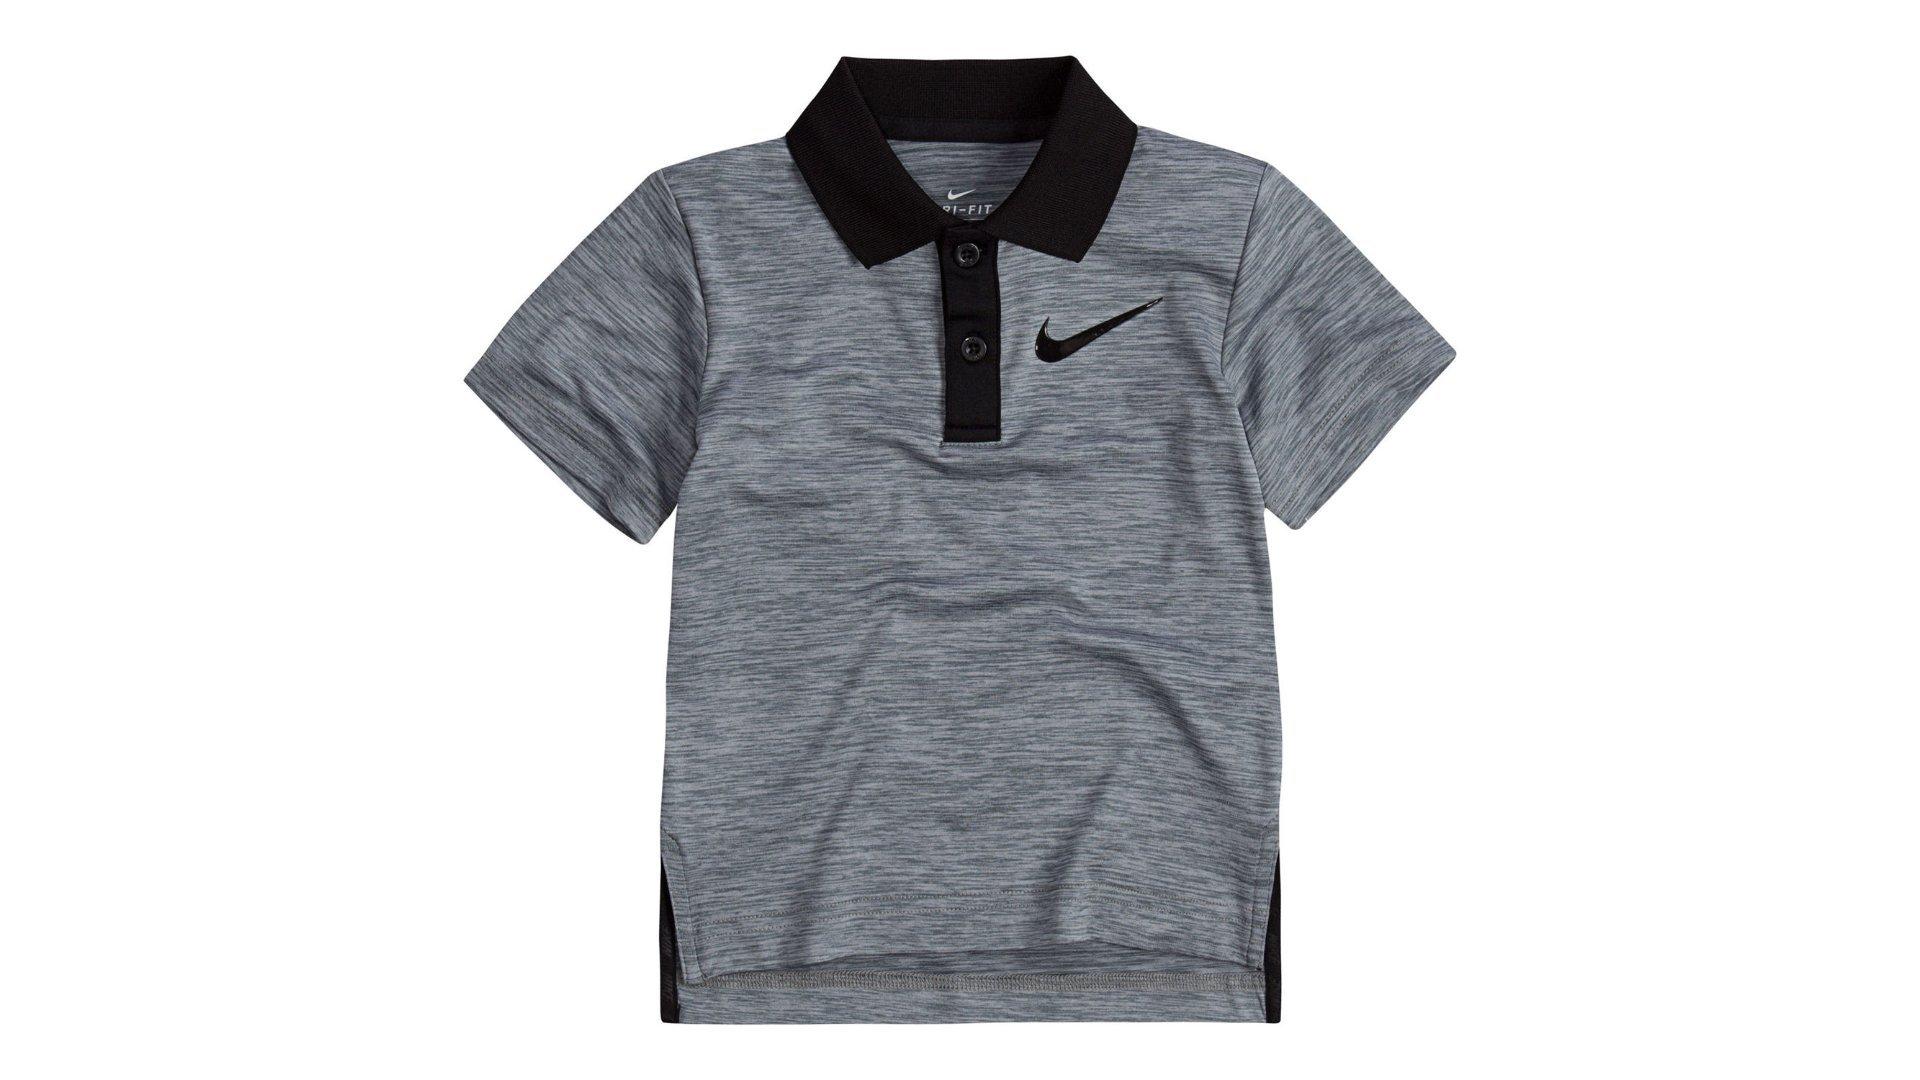 Nike Little Boys' Short Sleeve Polo Shirt (Cool Grey Heather (76C217-G1D) / Black/Black, 2T)